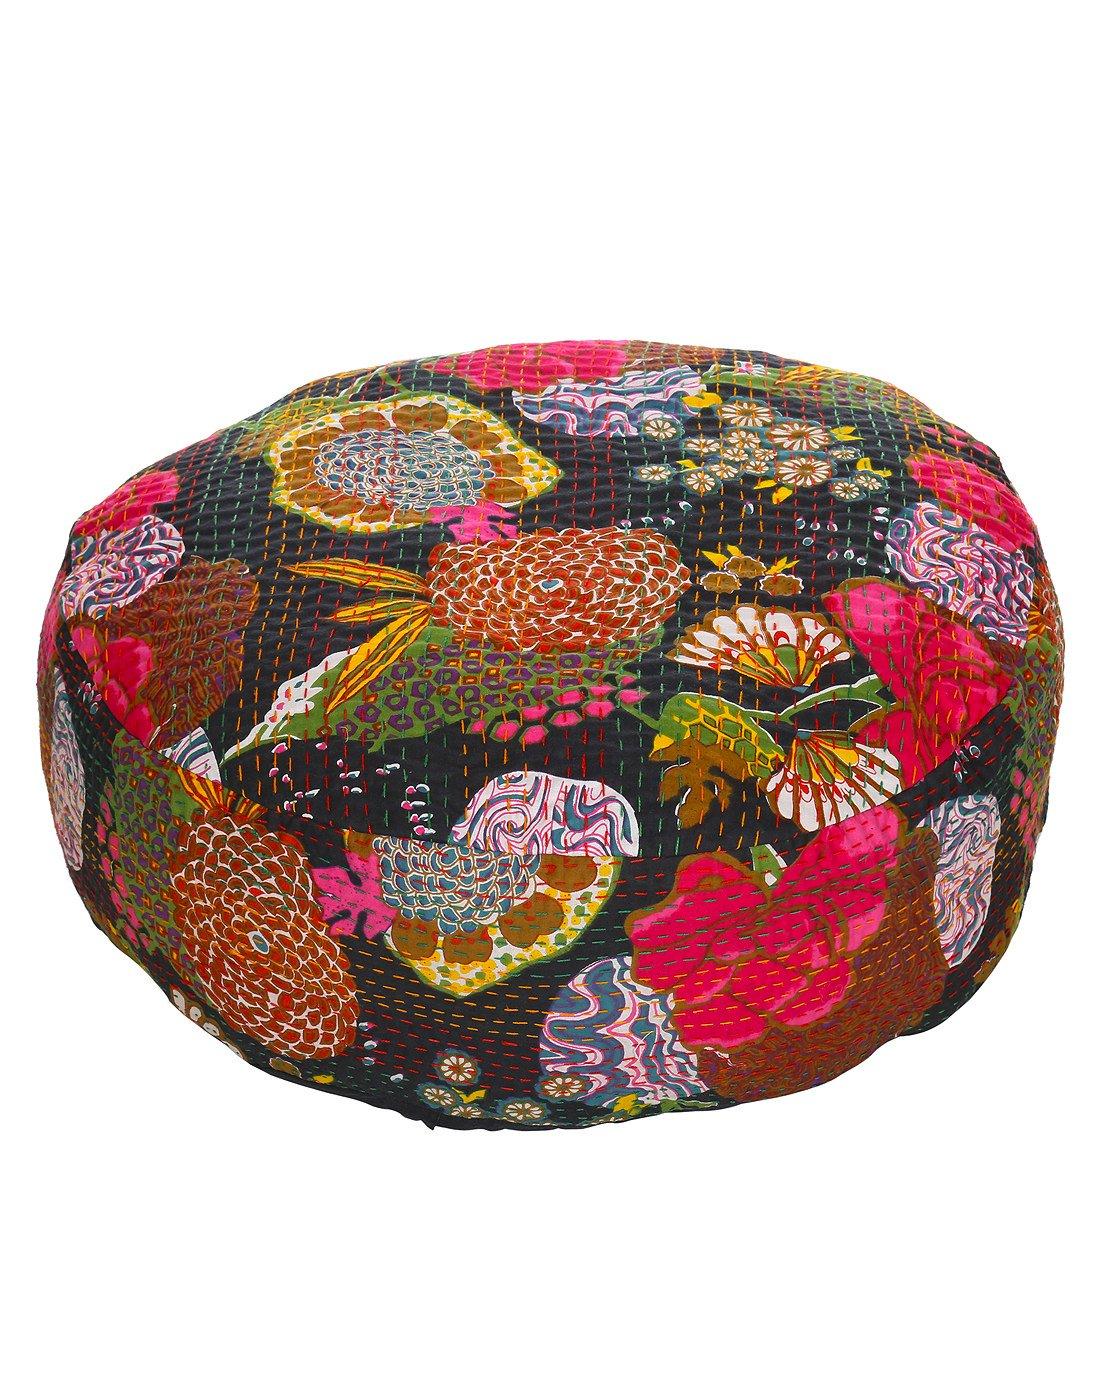 Rajrang Elegant Fruit Cushion Cover Black Cotton Kantha Work Cushion Cover OTM01131